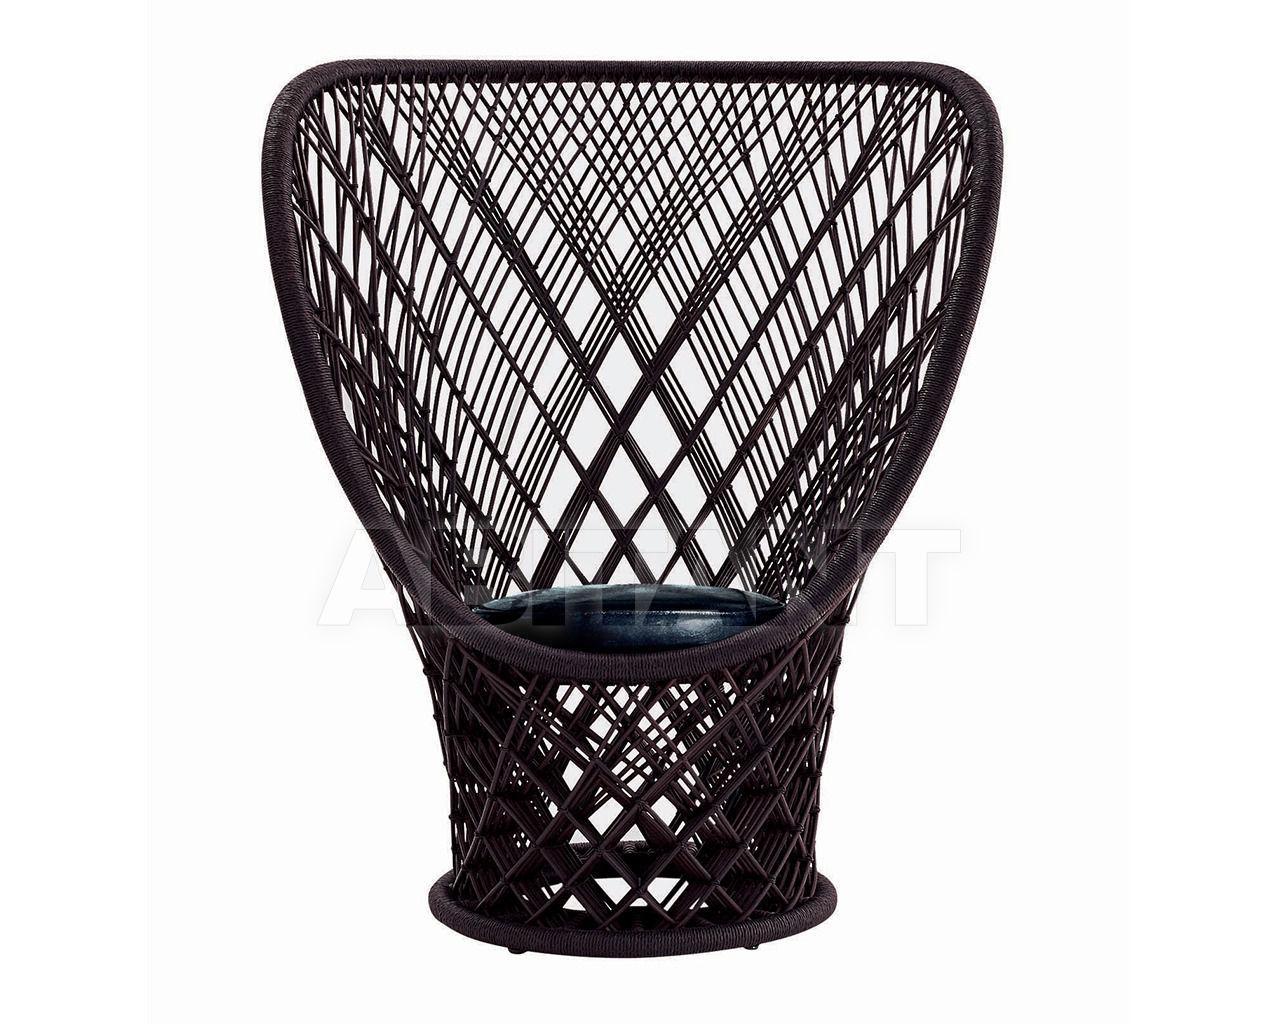 Купить Кресло для террасы PAVO Driade L`arte Di Abitare 9820175